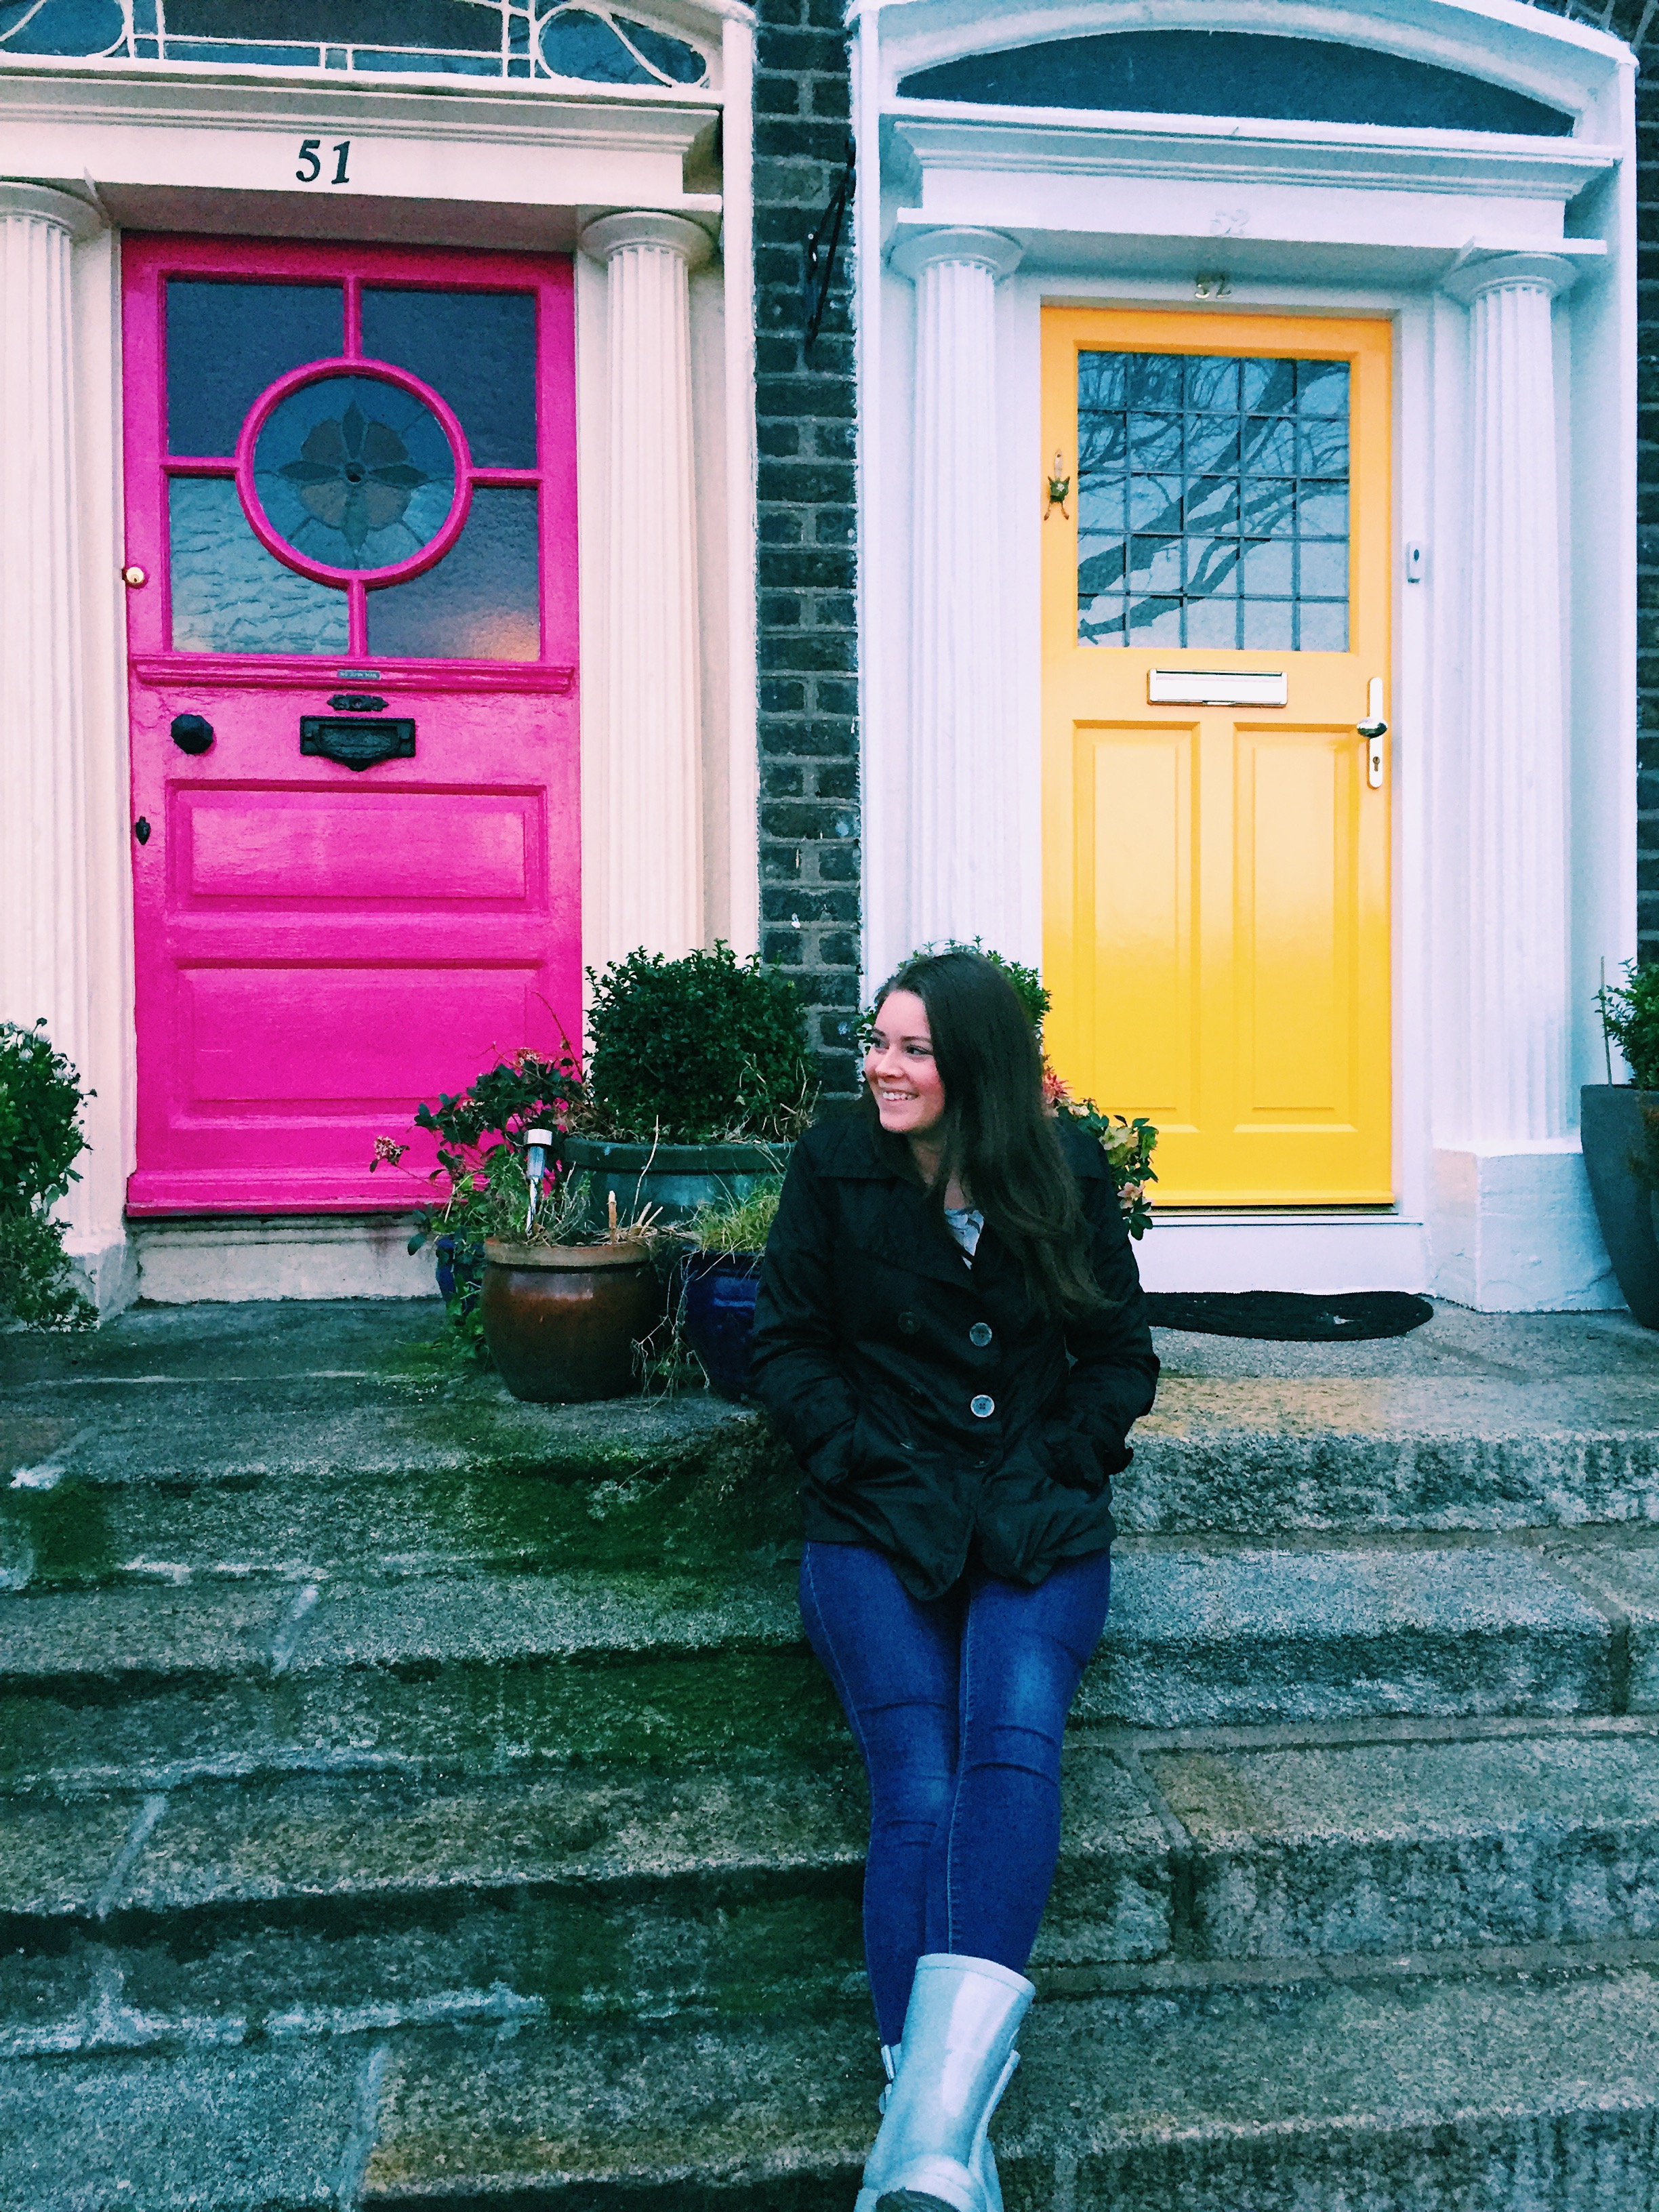 Pretty Painted Doors in Dublin